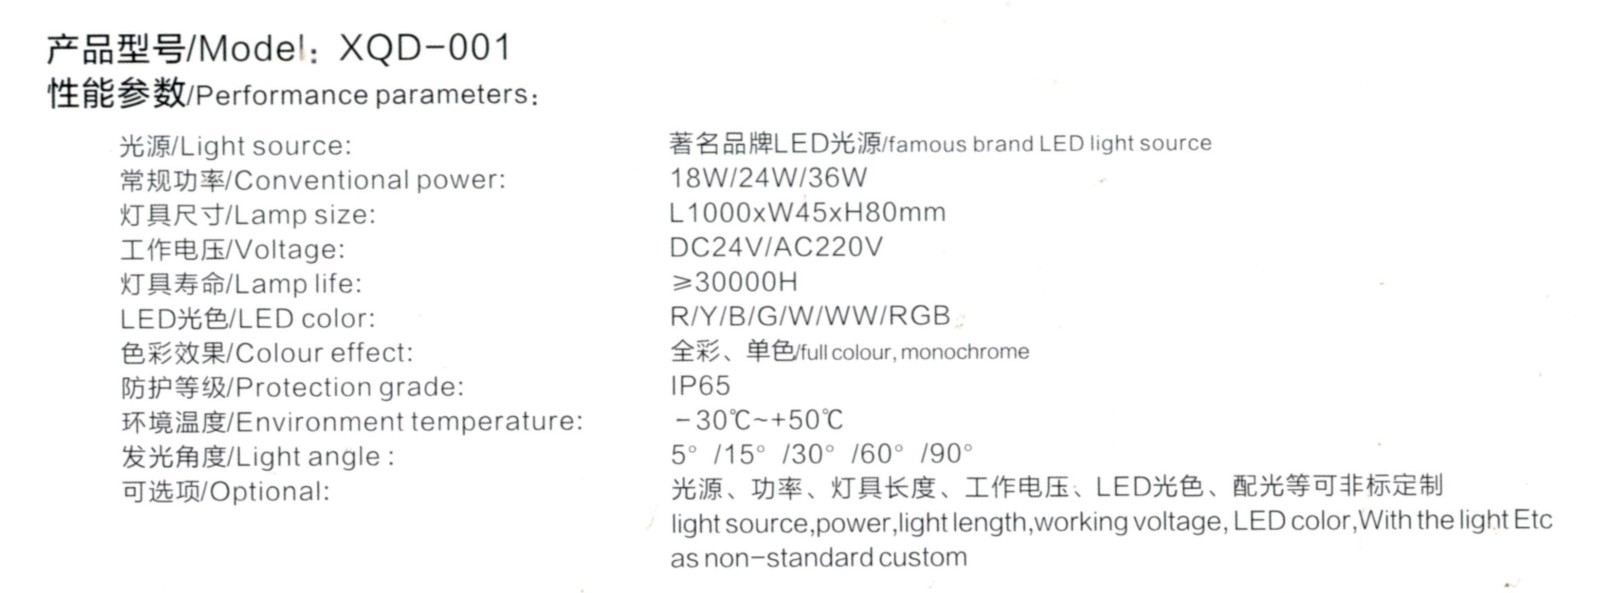 LED洗墙灯Model∶XQD-001参数.jpg